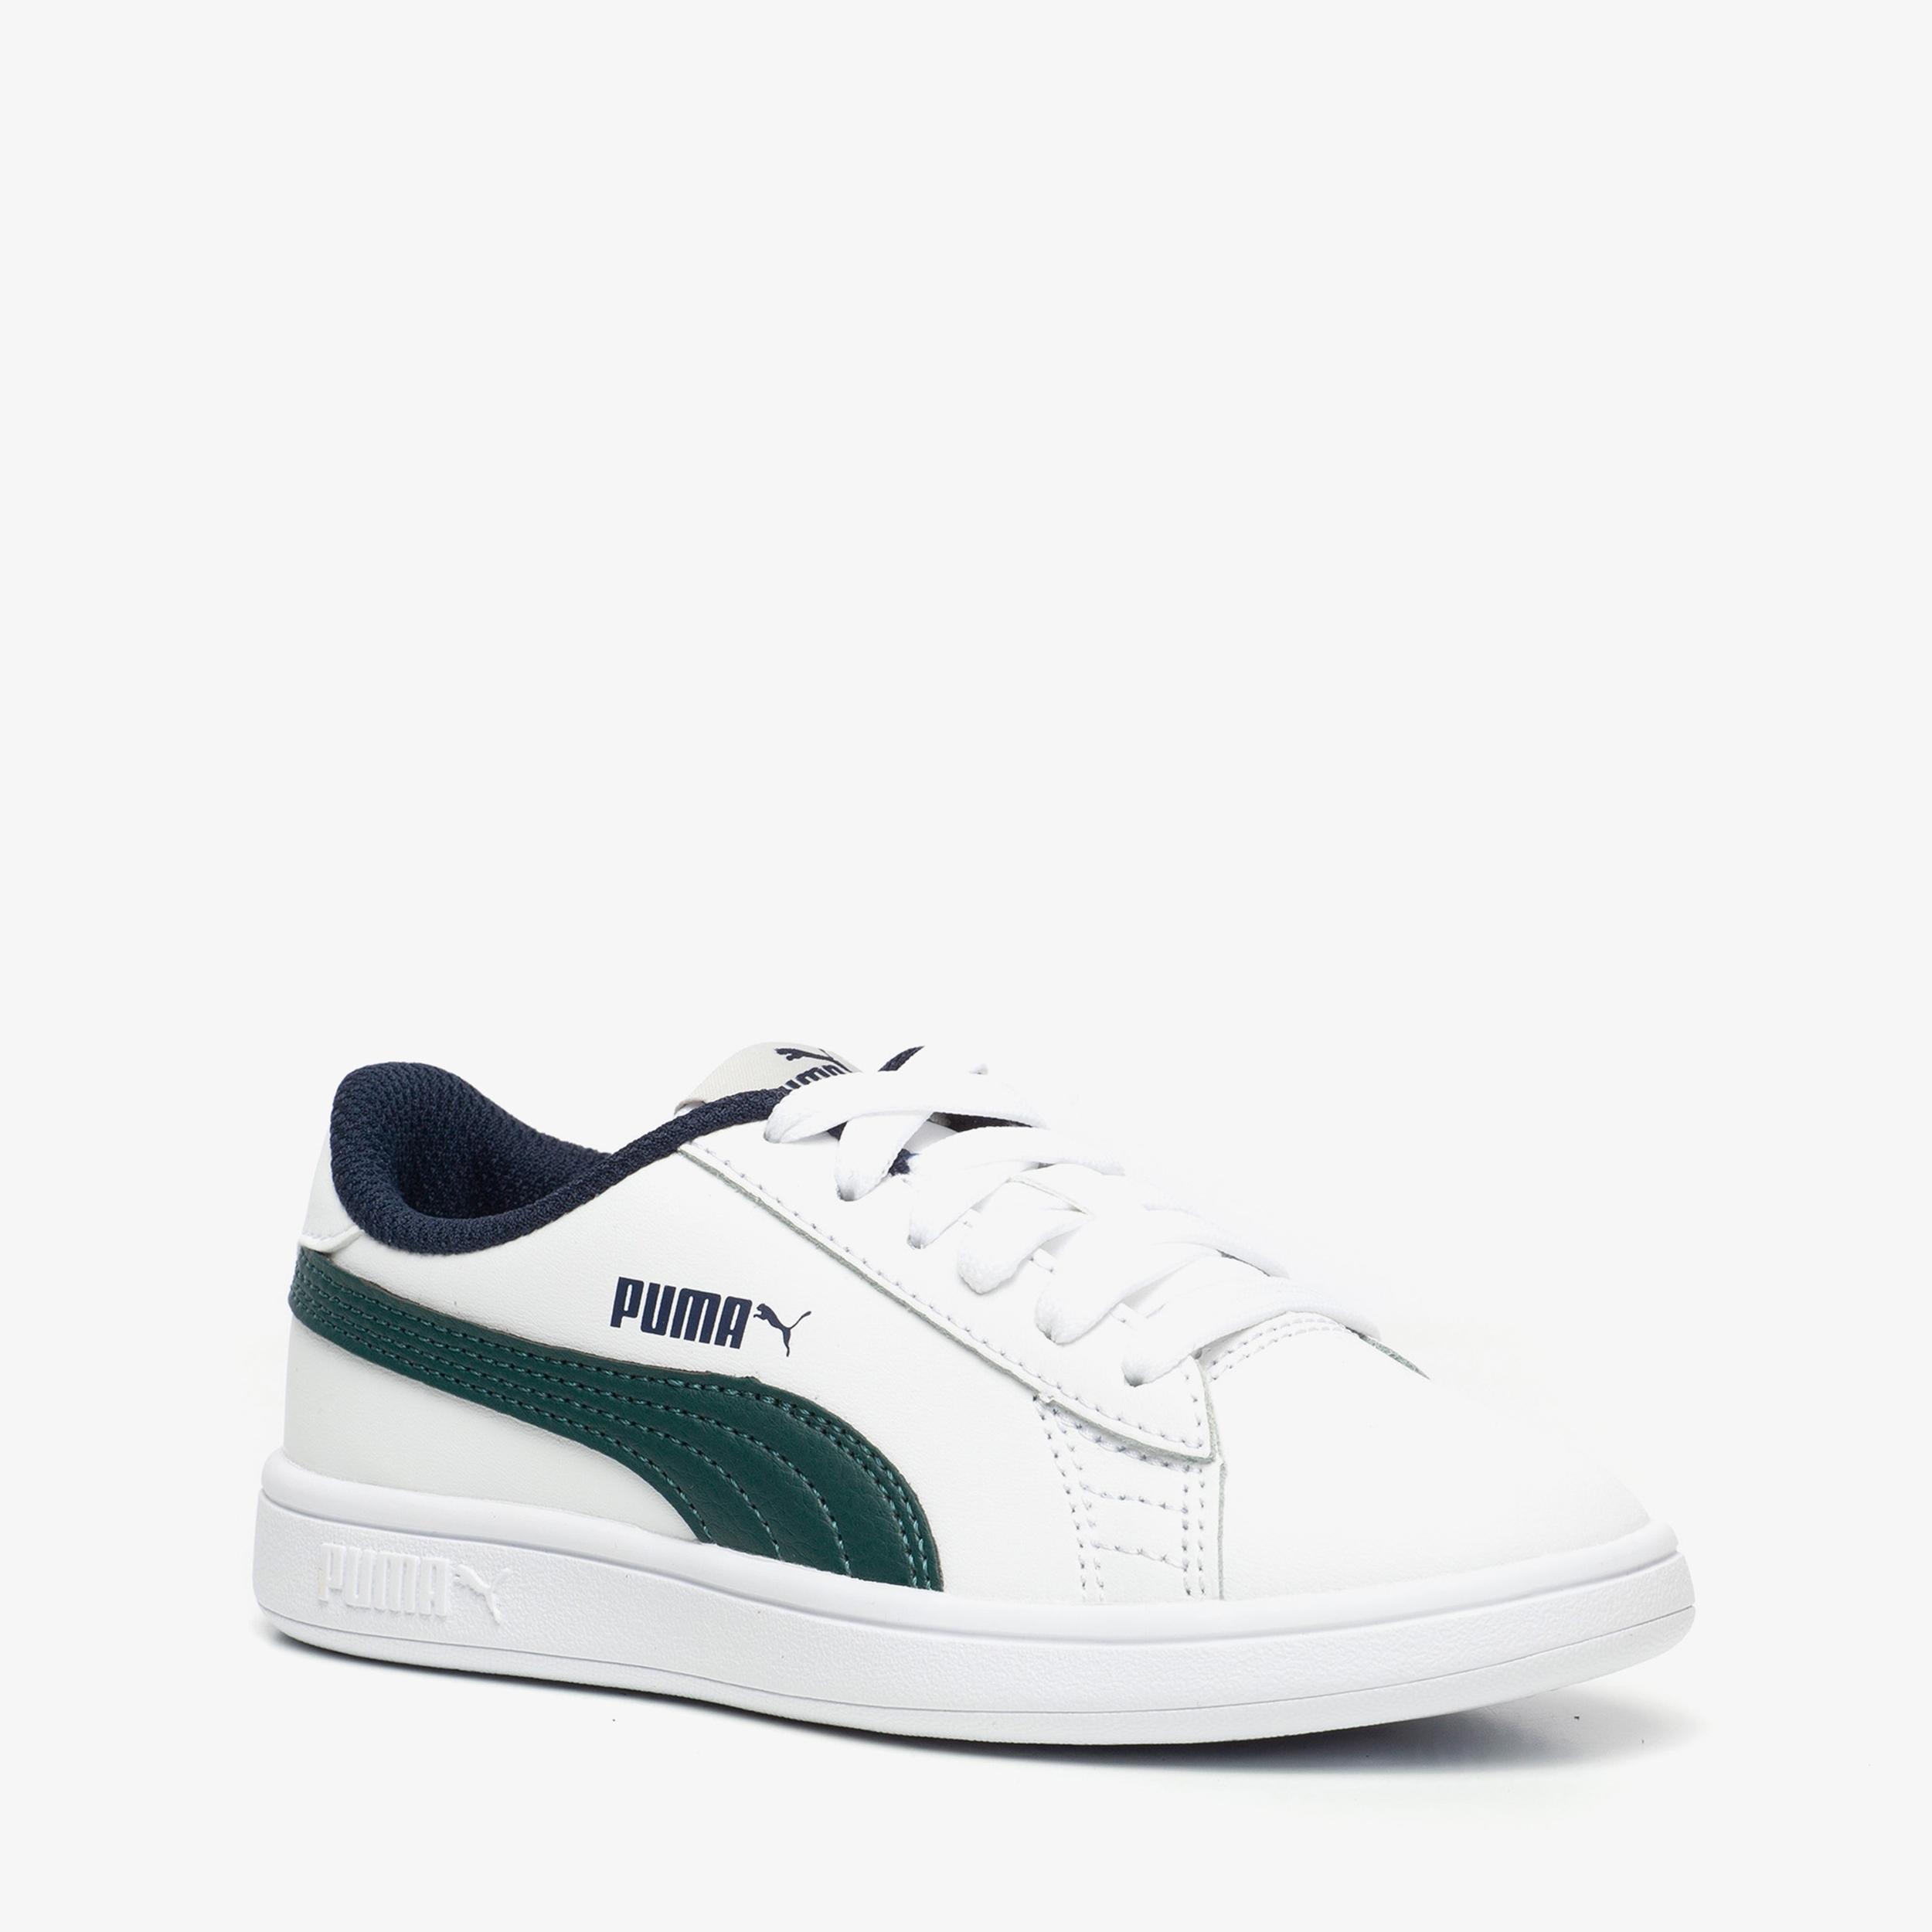 Puma Smash V2 L PS kinder sneakers | Scapino.nl